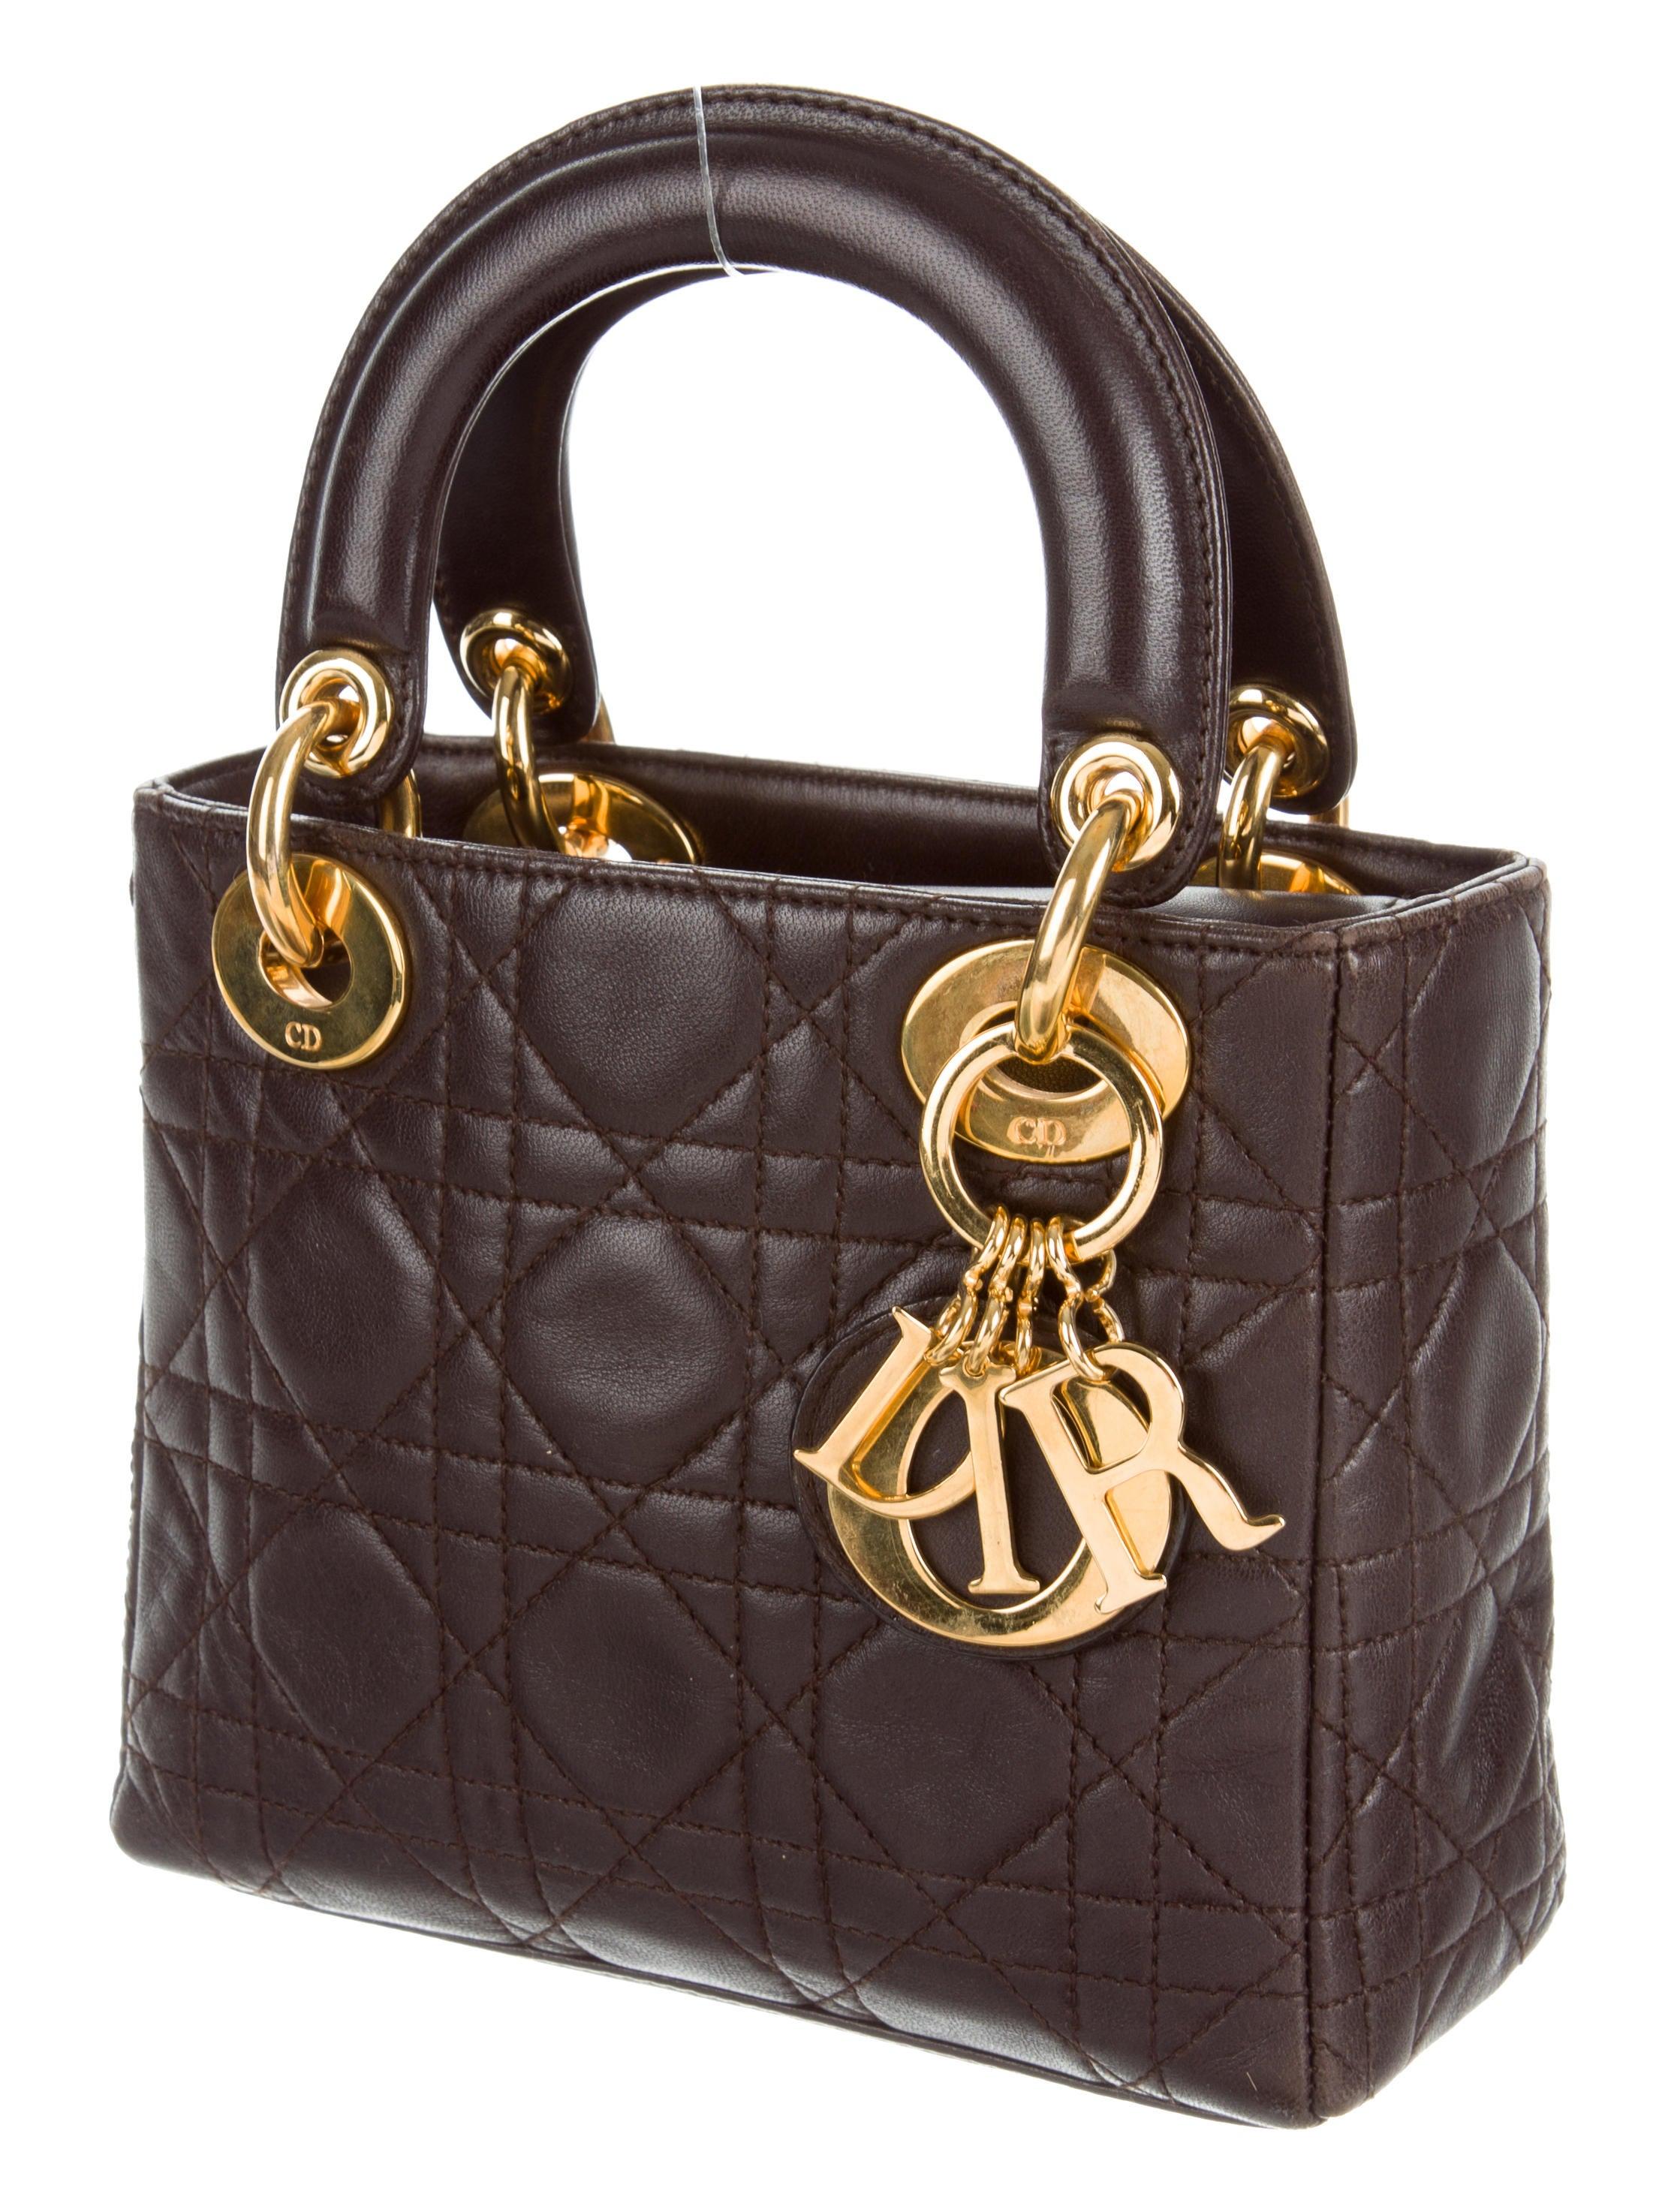 christian dior mini lady dior bag handbags chr59545 the realreal. Black Bedroom Furniture Sets. Home Design Ideas